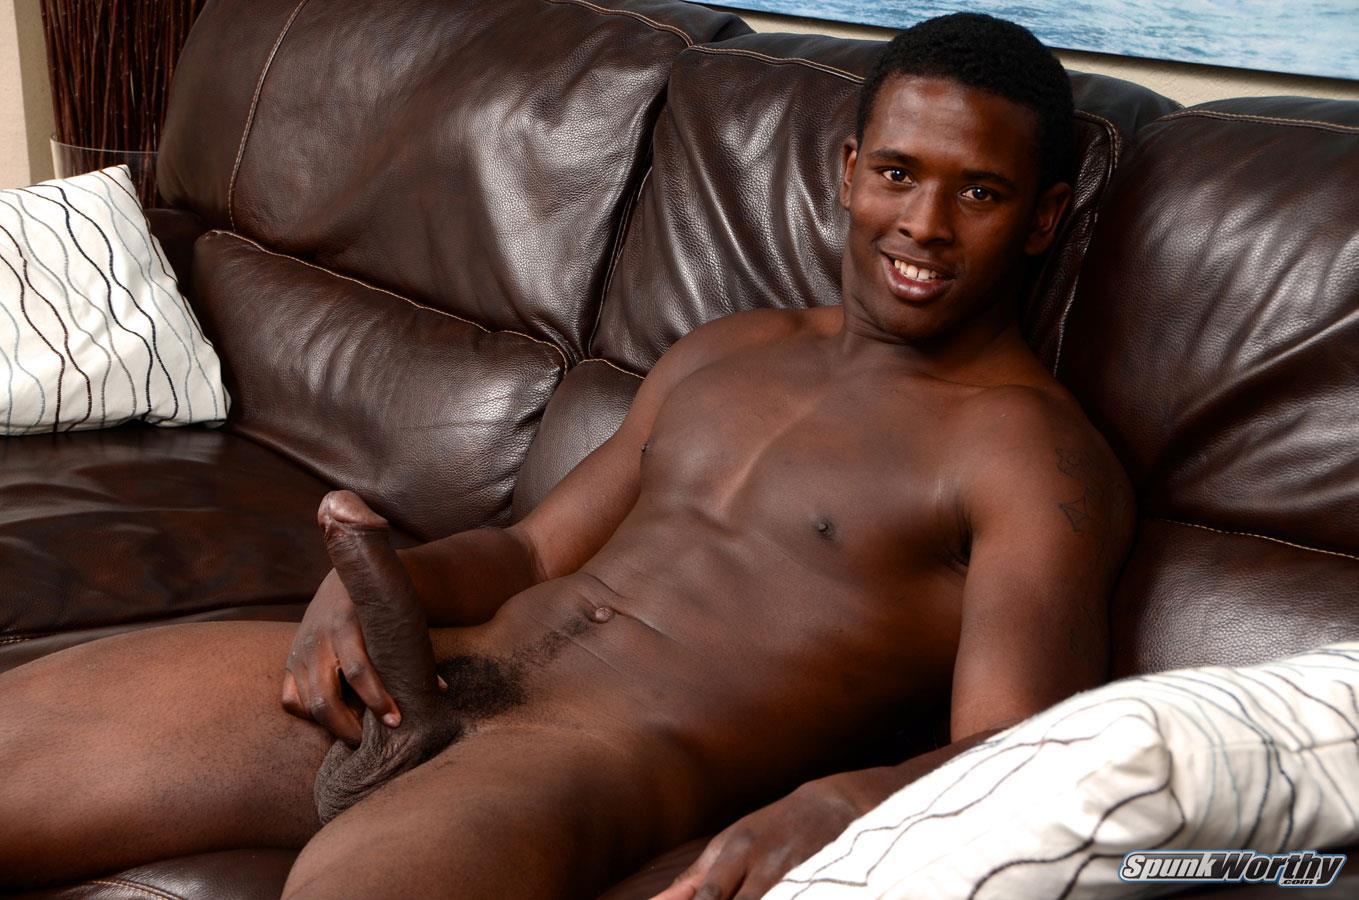 Cabin Fever Porn Gay sexy gay ebony porn - megapornx